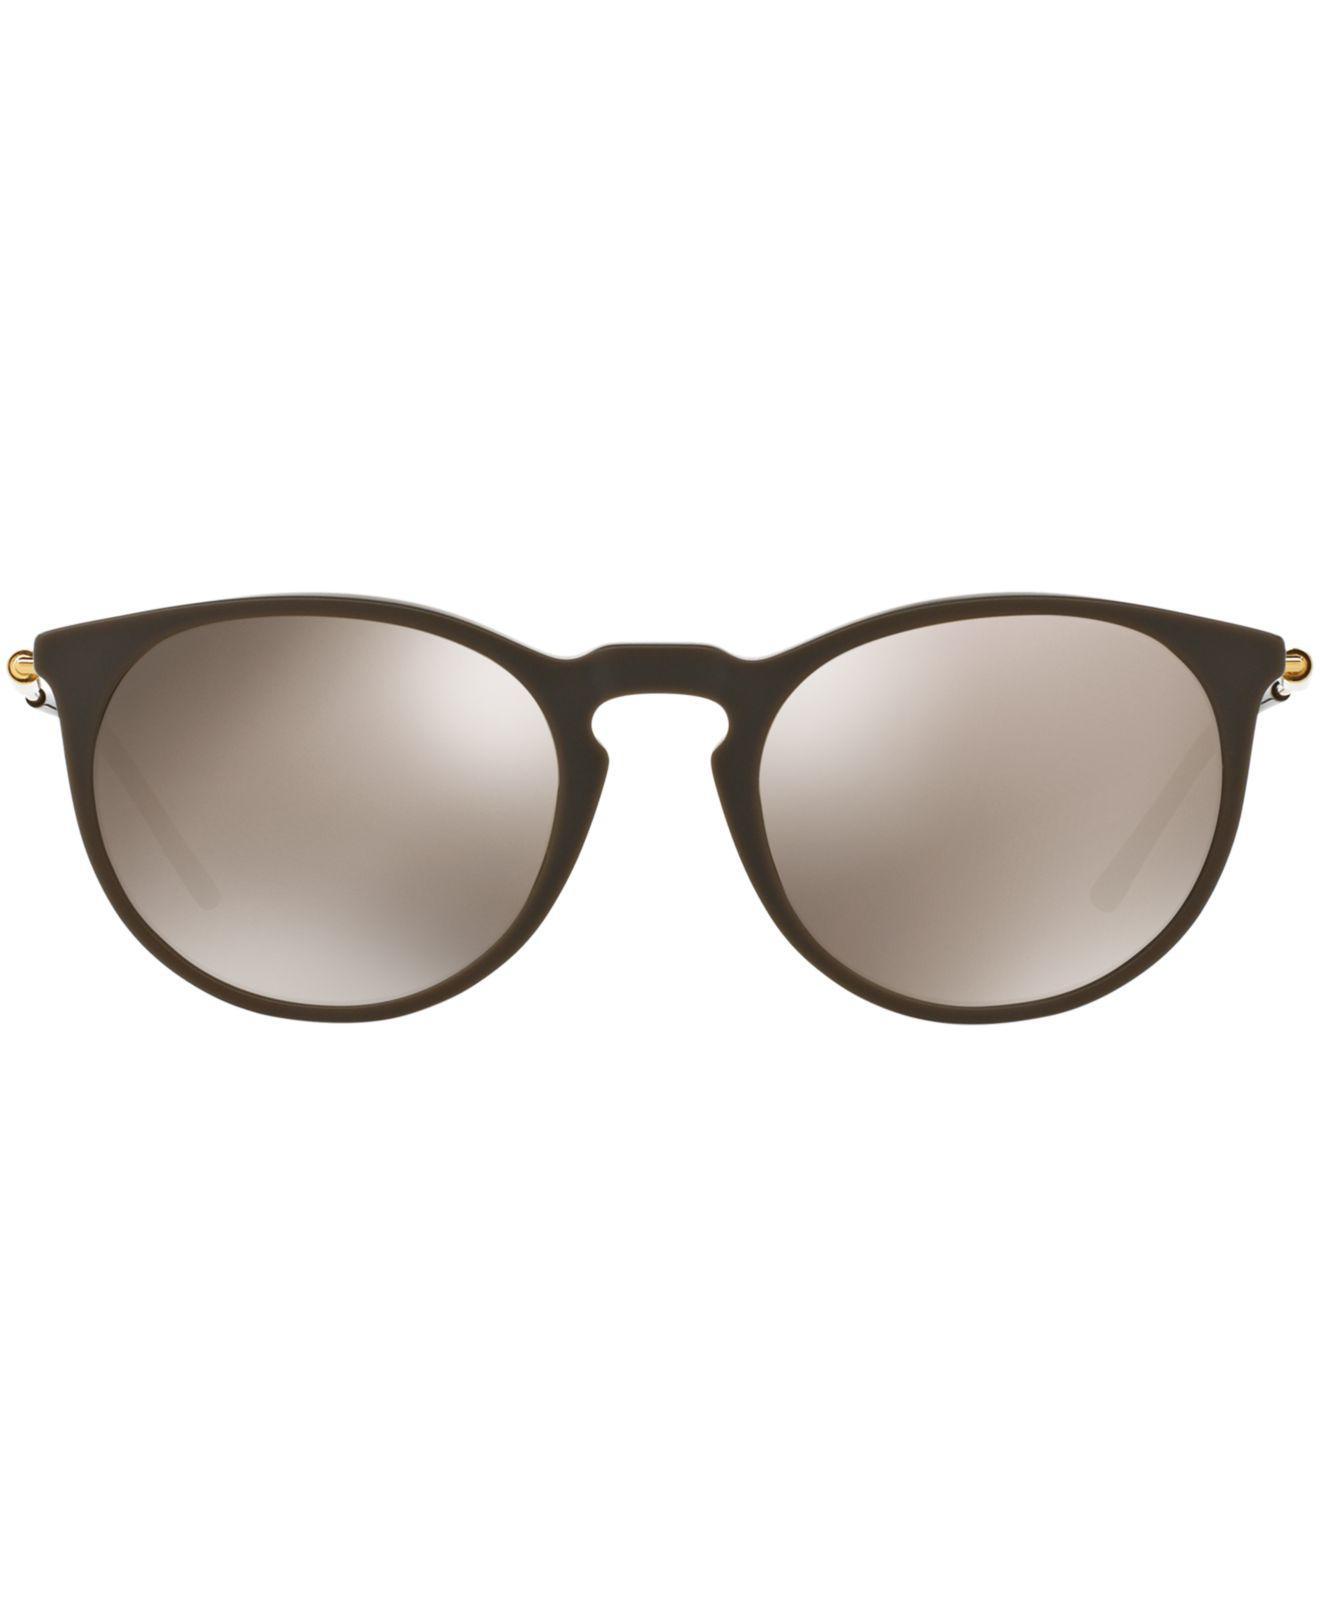 1cd4bb7135ce Lyst - Versace Sunglasses